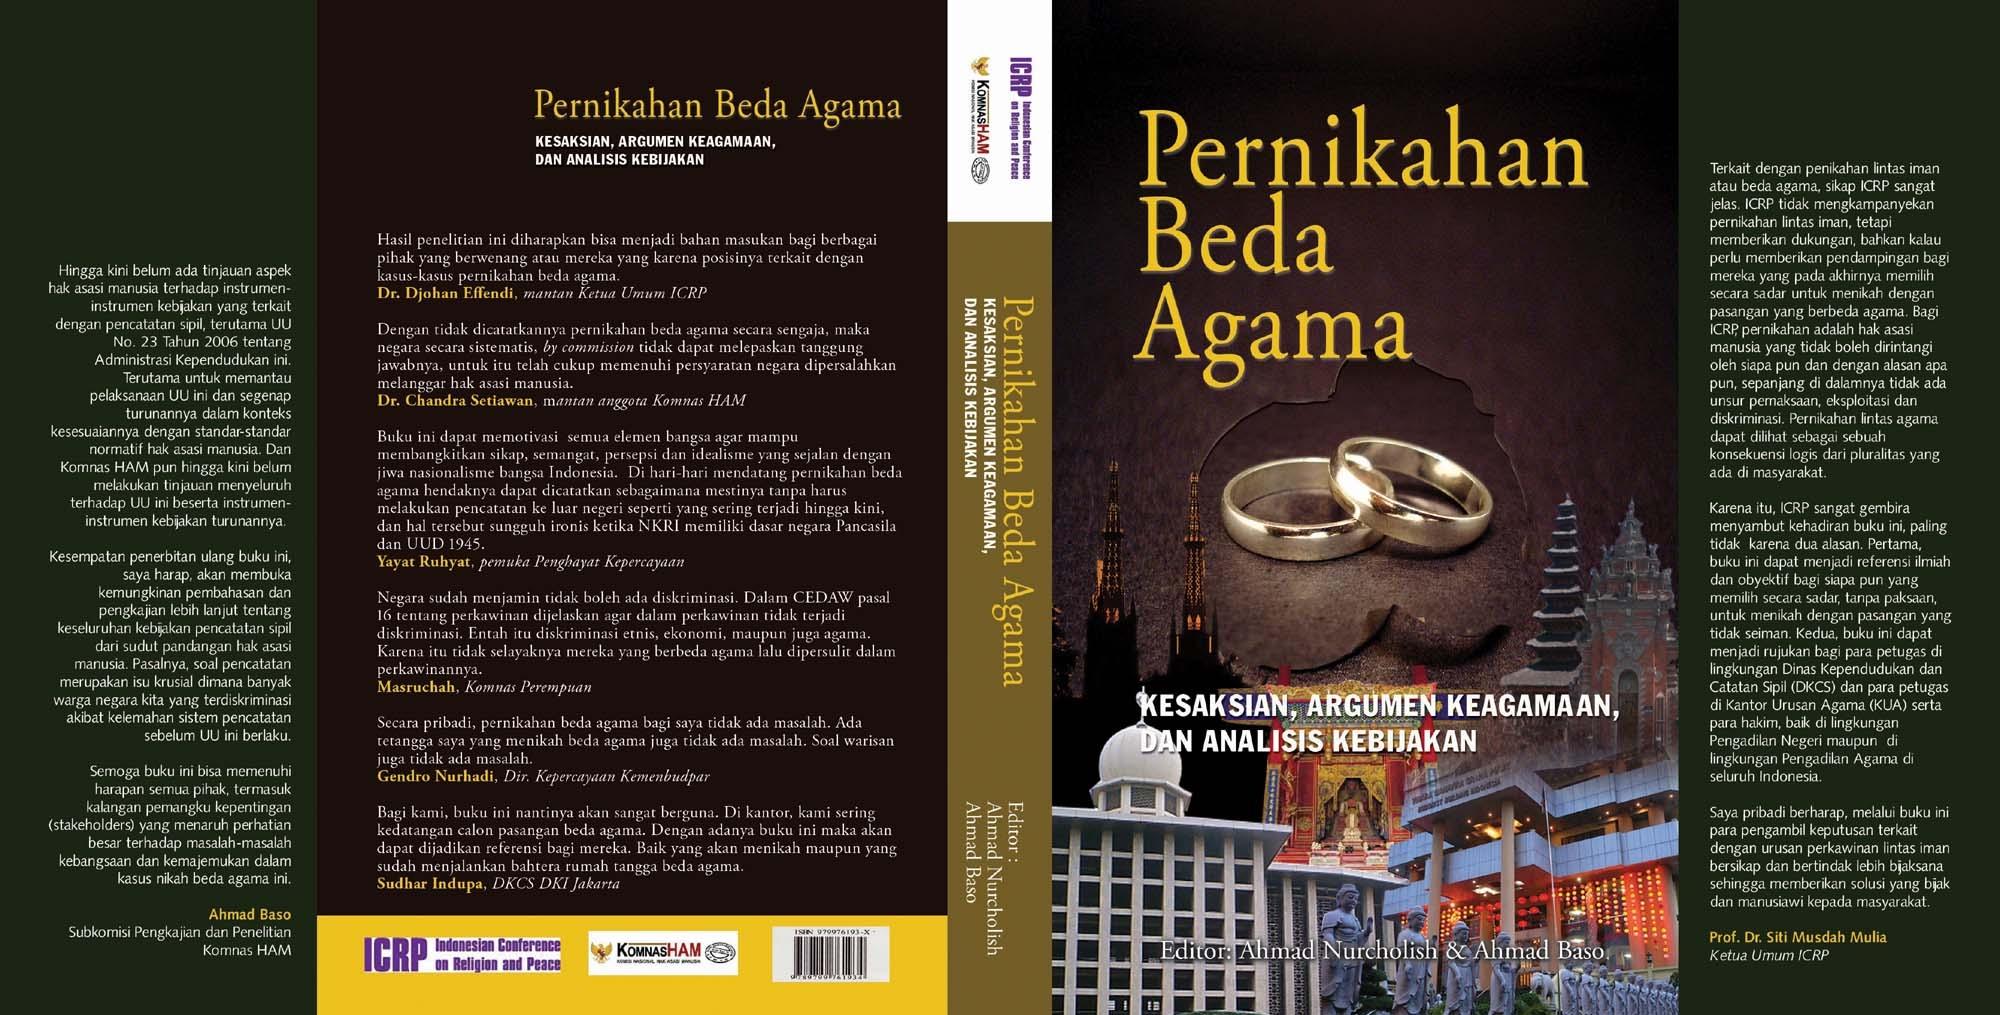 Pernikahan Beda Agama Ahmad Nurcholish